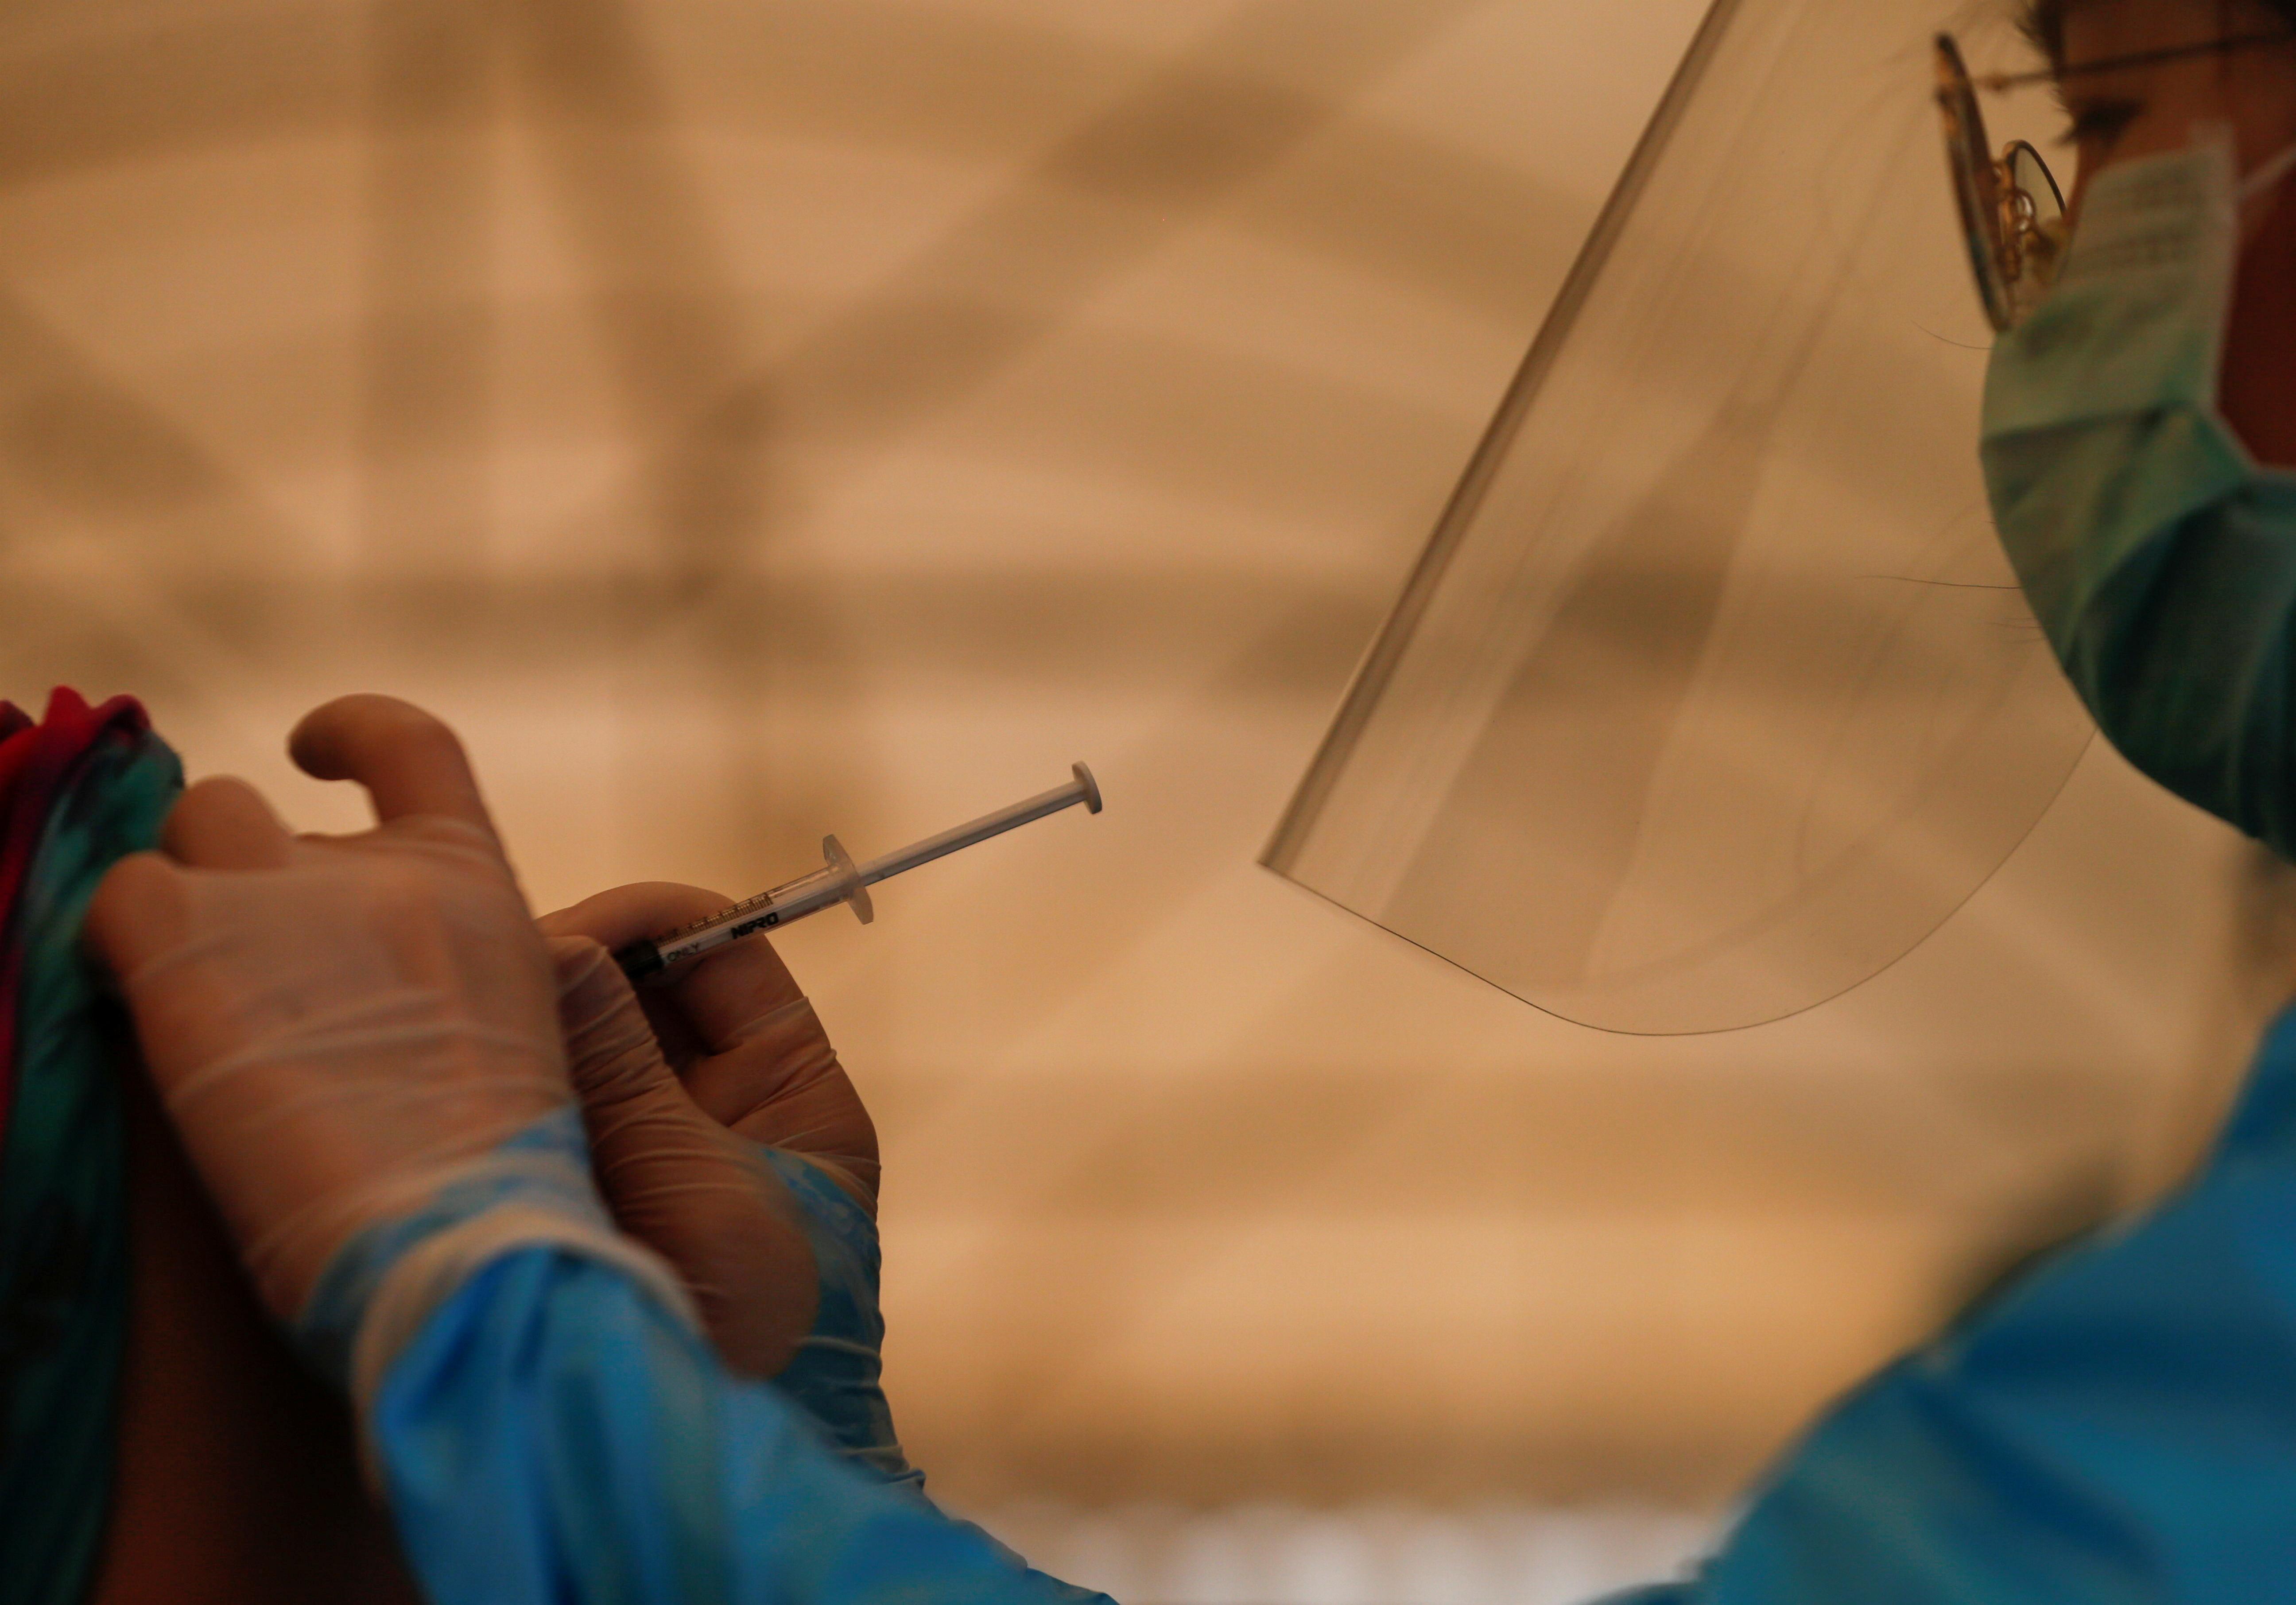 A person from Klong Toey community receives a coronavirus disease (COVID-19) vaccine in Bangkok, Thailand, May 4, 2021. REUTERS/Soe Zeya Tun